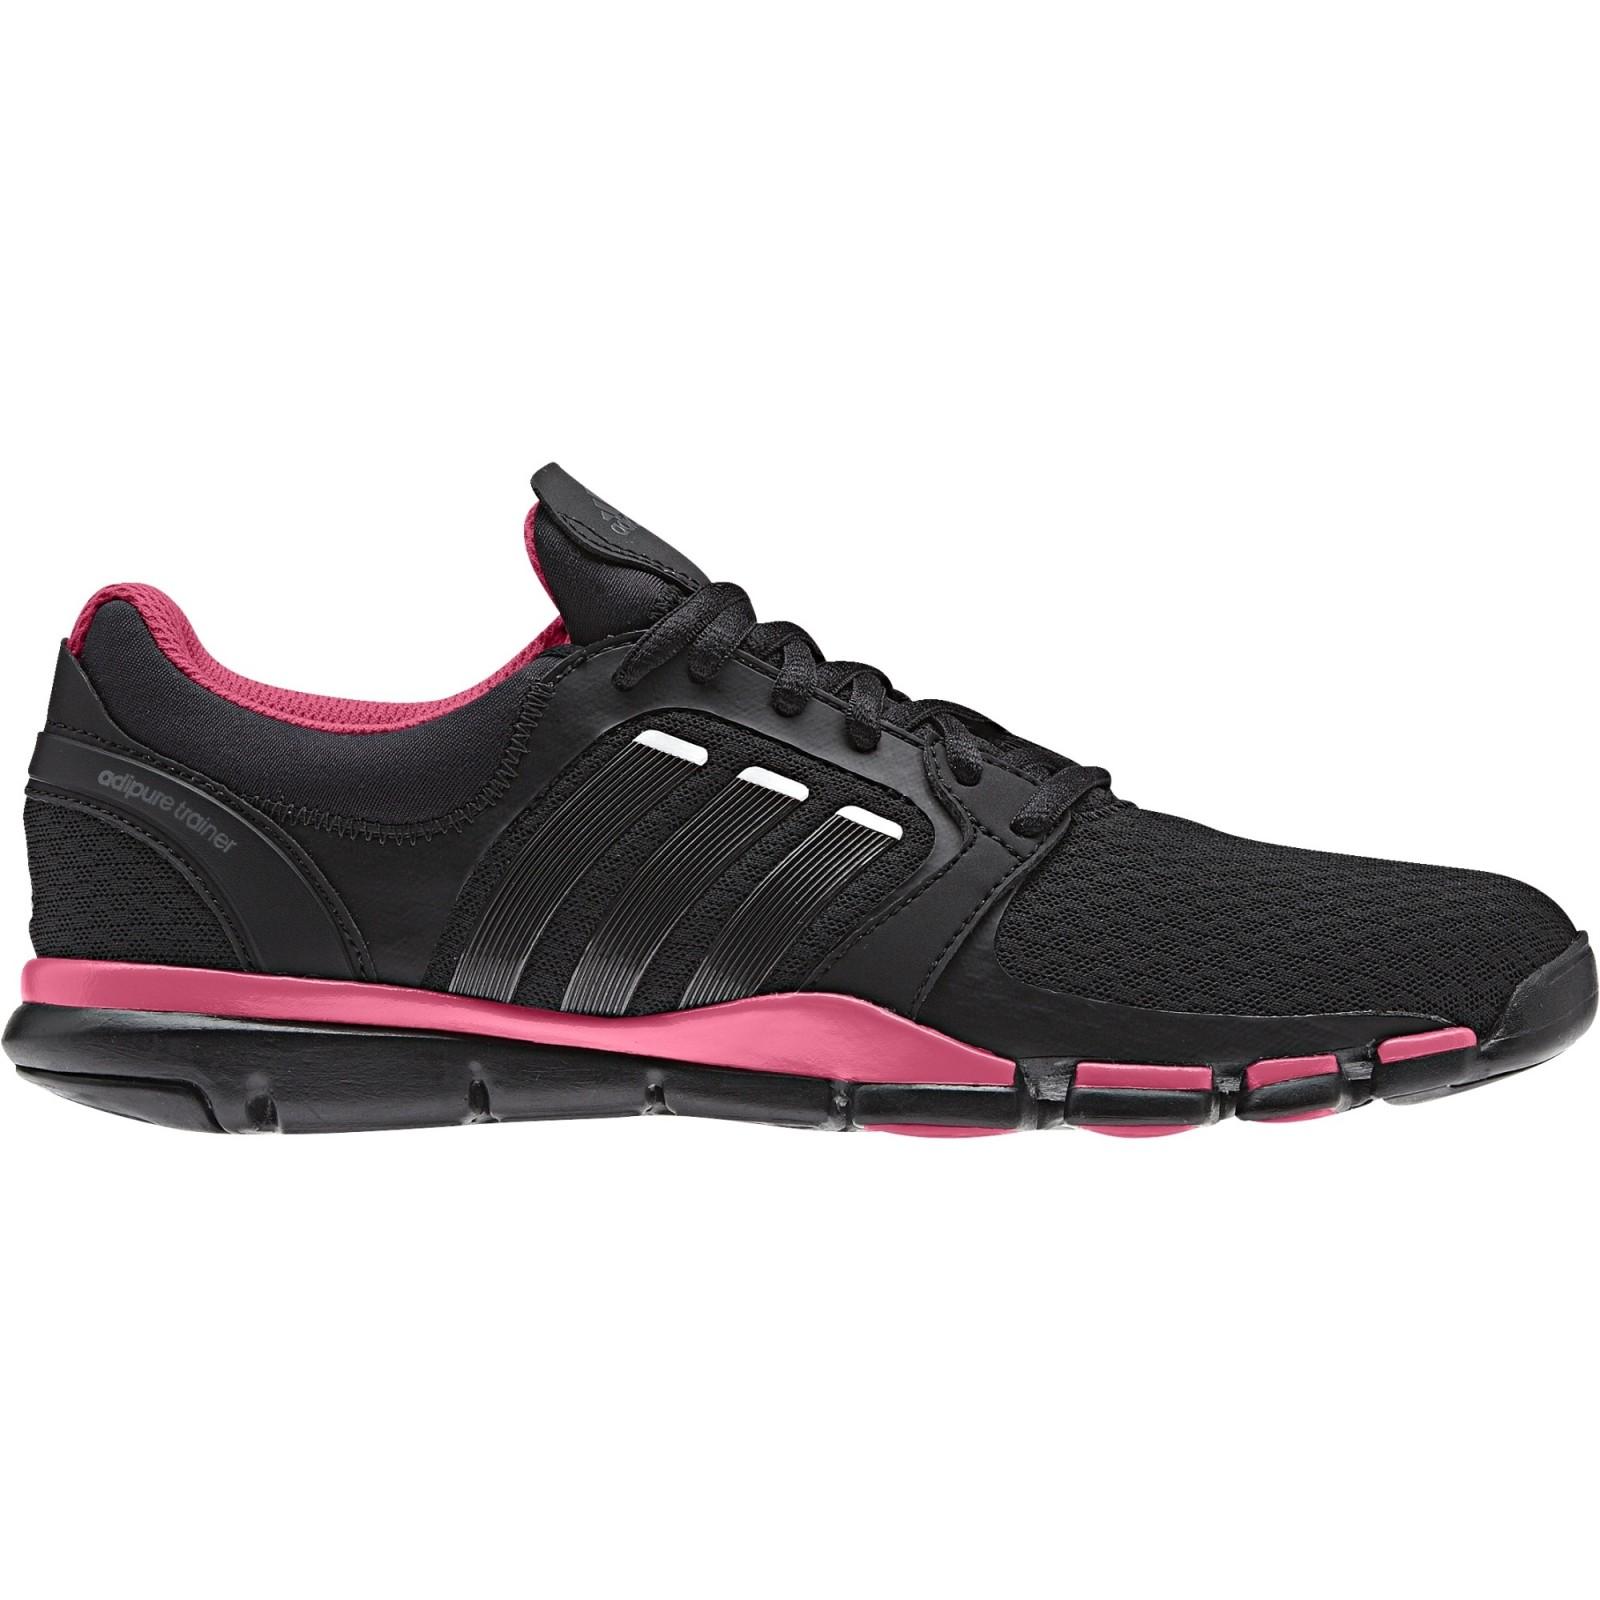 Dámská fitness obuv adidas Adipure TR 360W  c33ad6c611